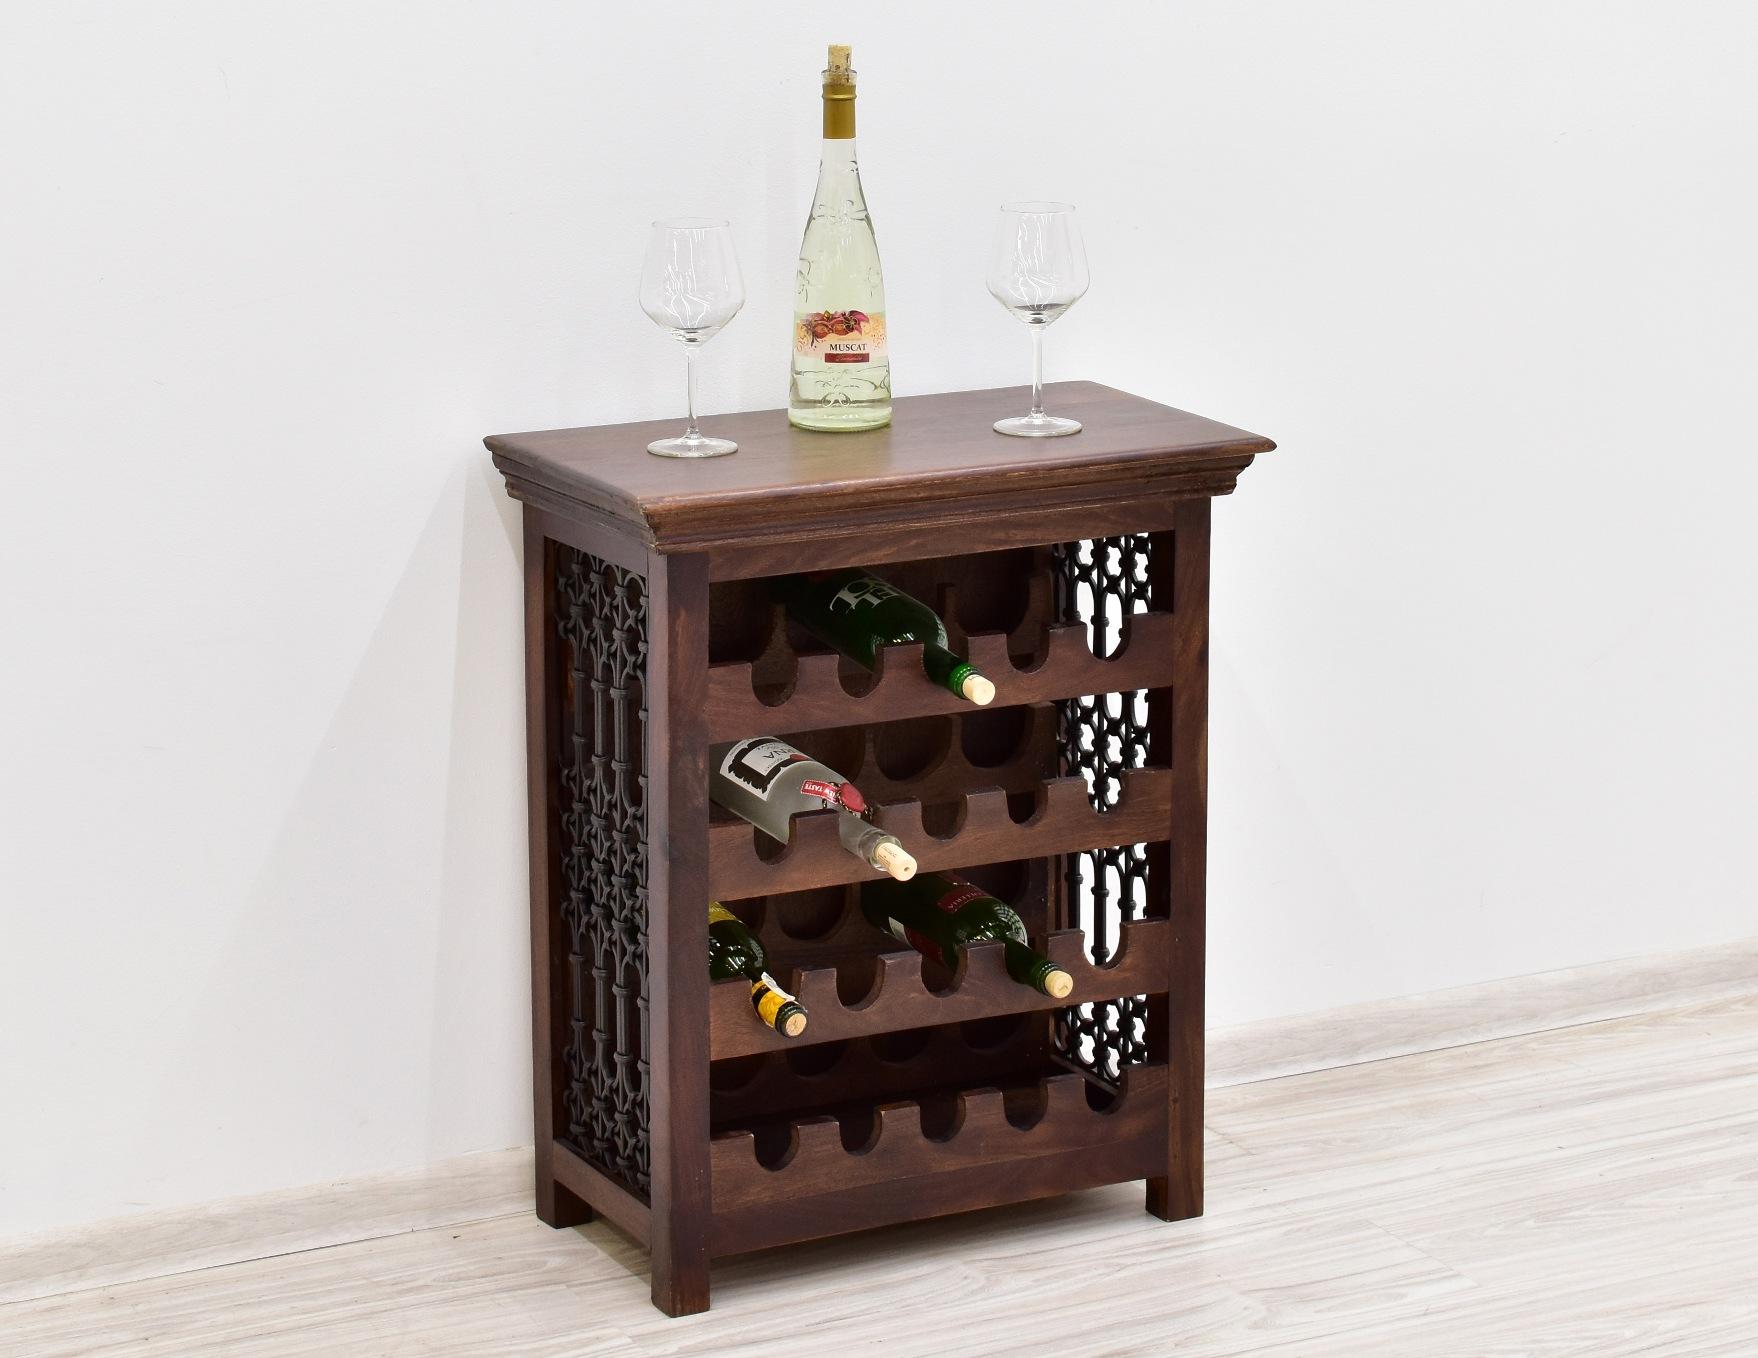 szafka na wino drewno palisander metaloplastyka (1)